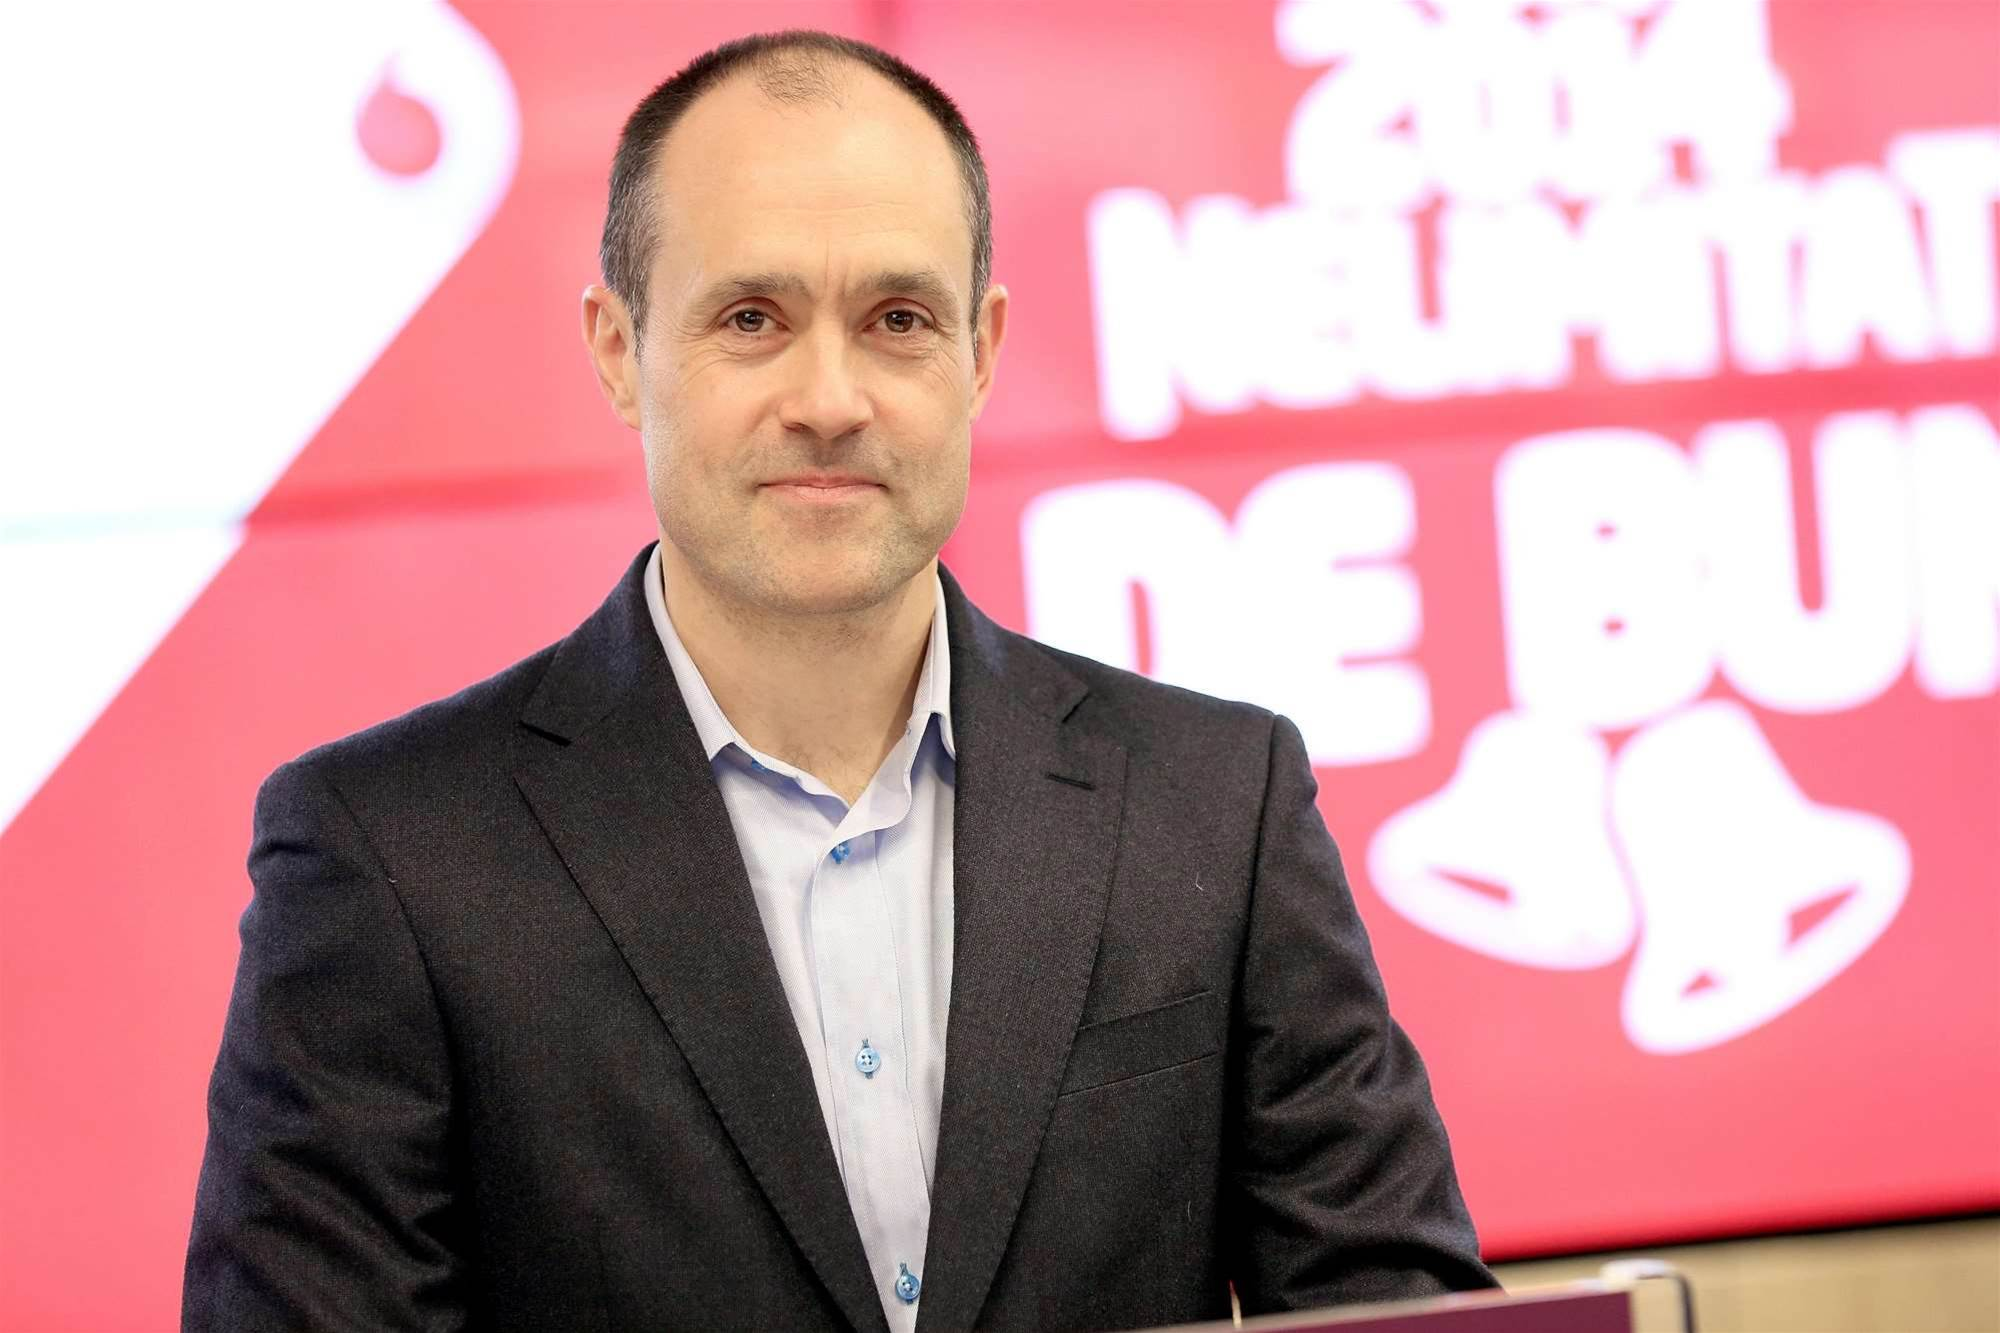 Vodafone loses 46k customers